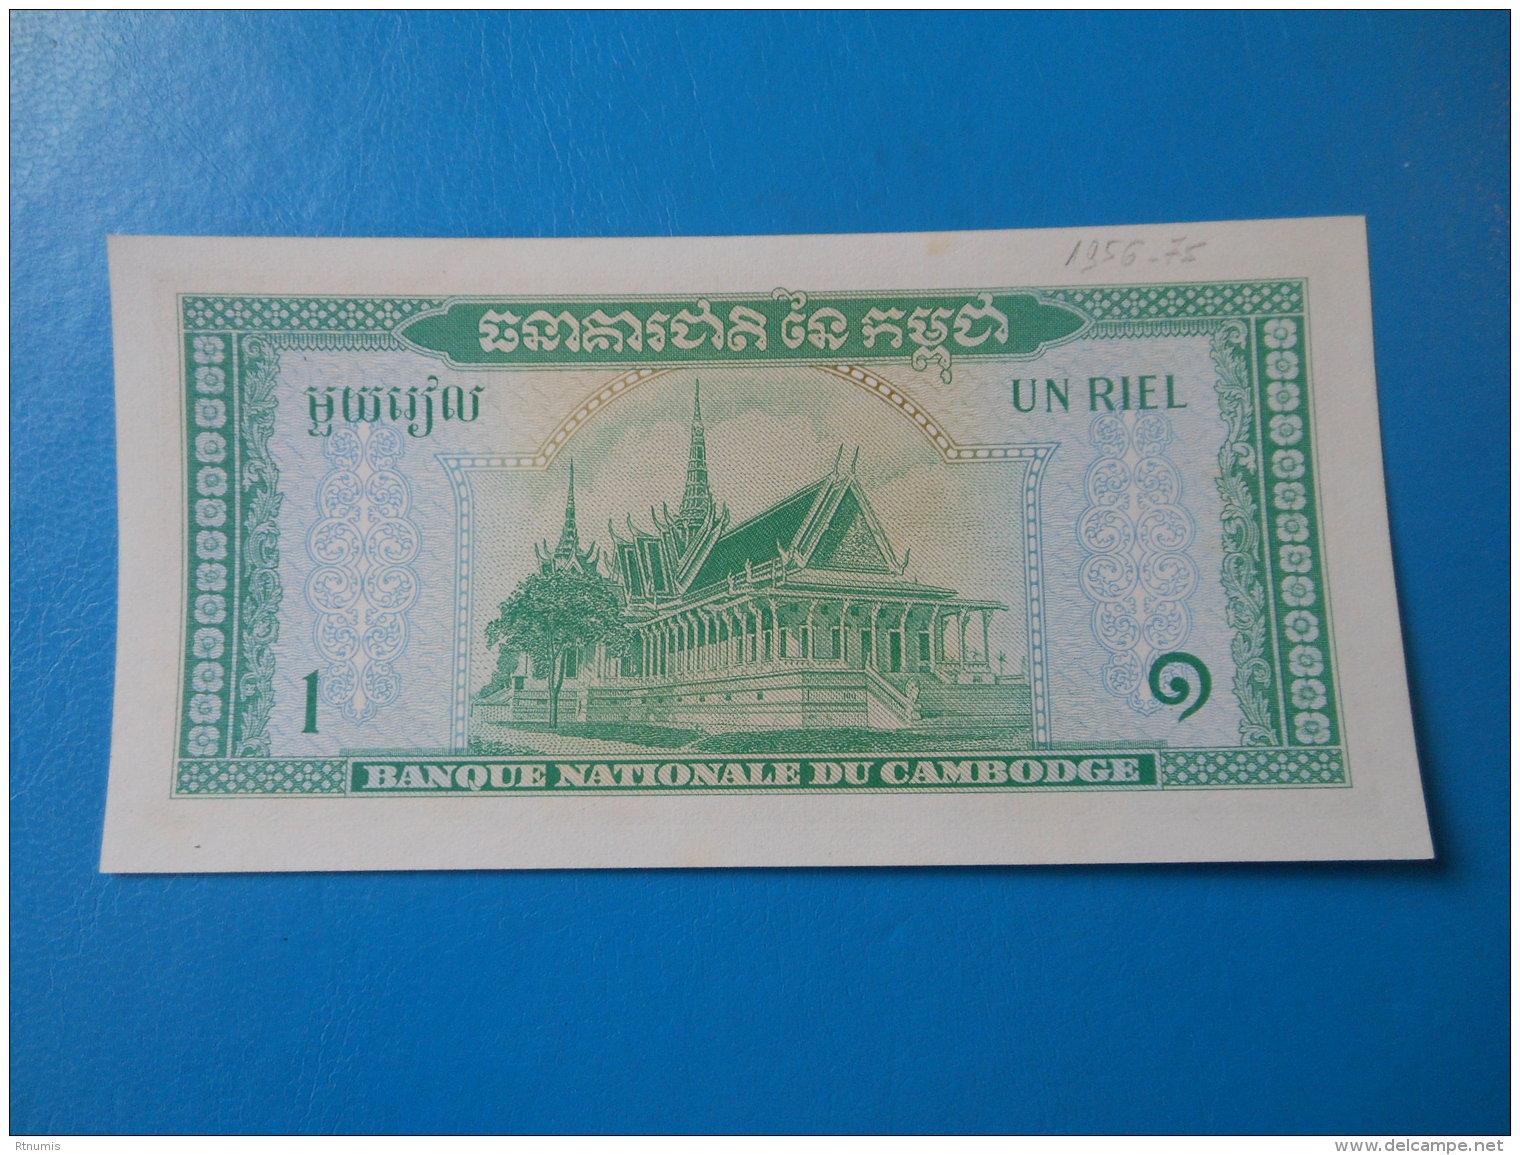 Cambodge Cambodia 1 Riel 1972 P4c UNC - Cambodia